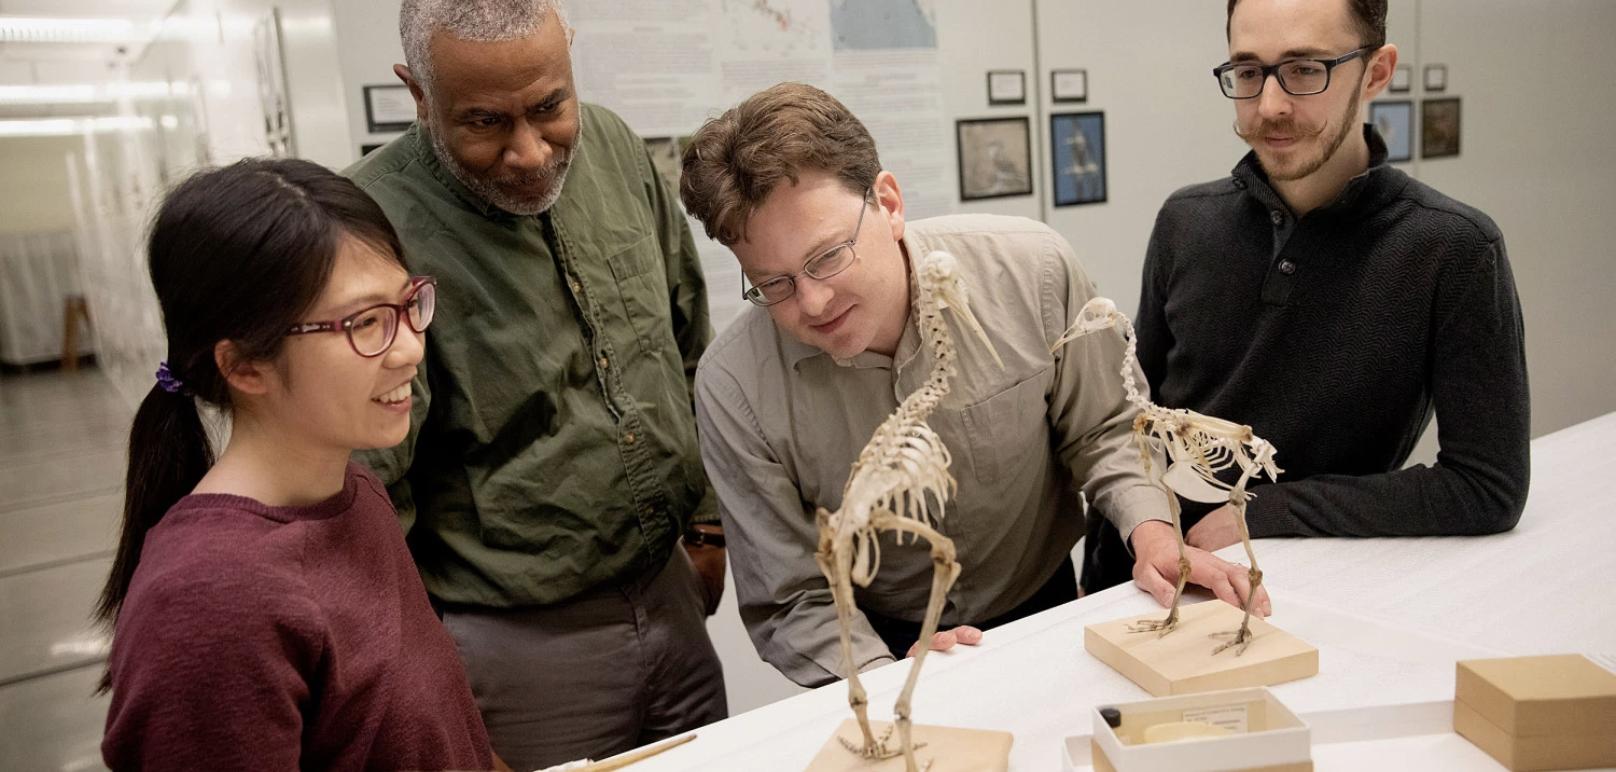 Convergent regulatory evolution & loss of flight in paleognathous birds